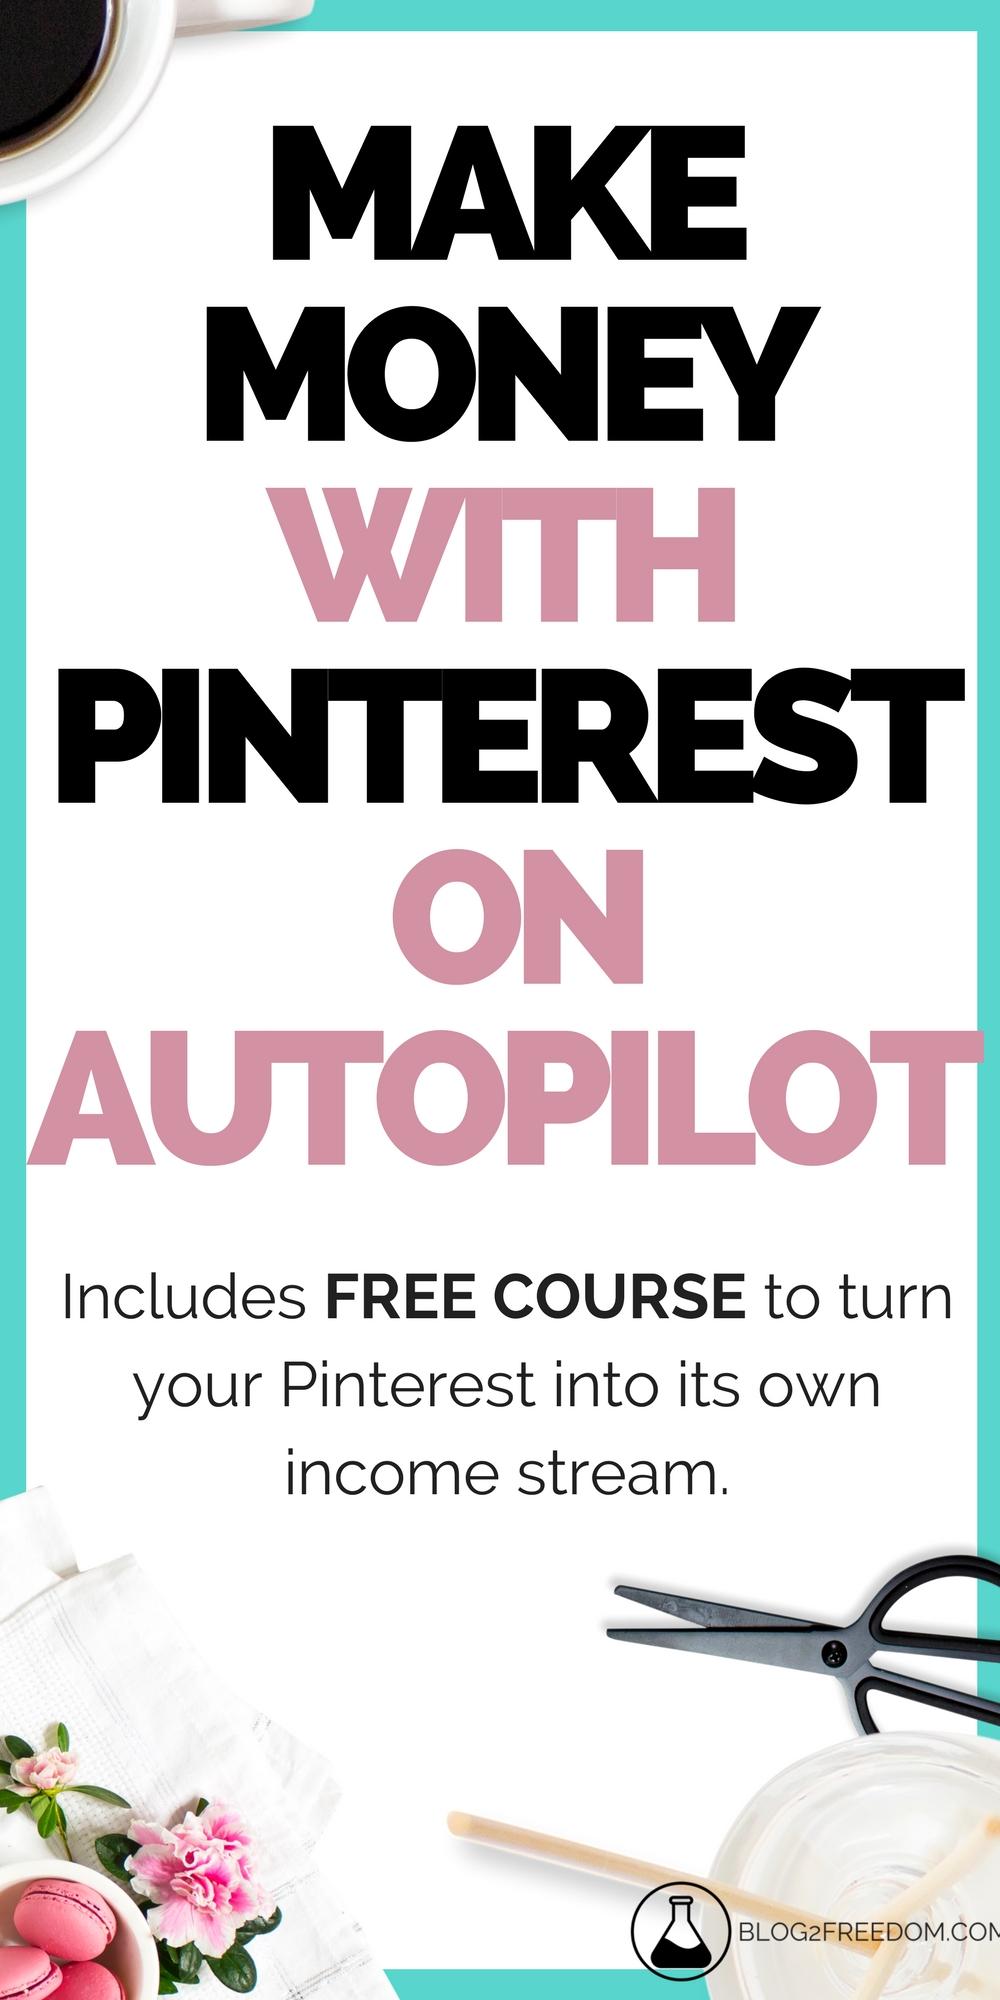 Make money with Pinterest